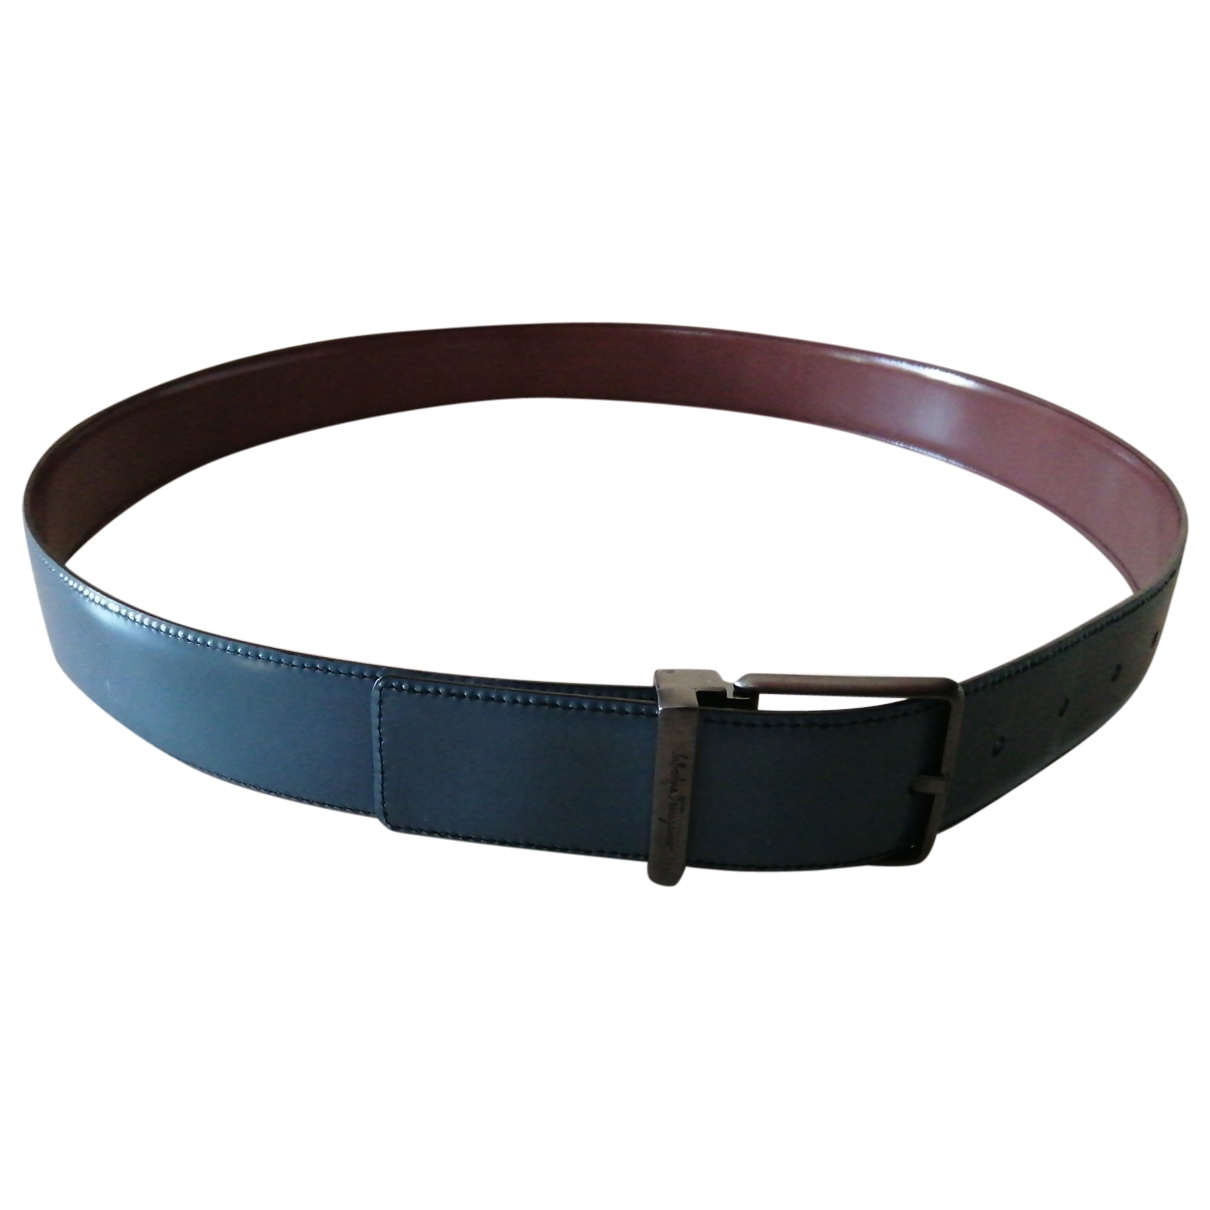 Salvatore Ferragamo \N Blue Leather belt for Men 100 cm